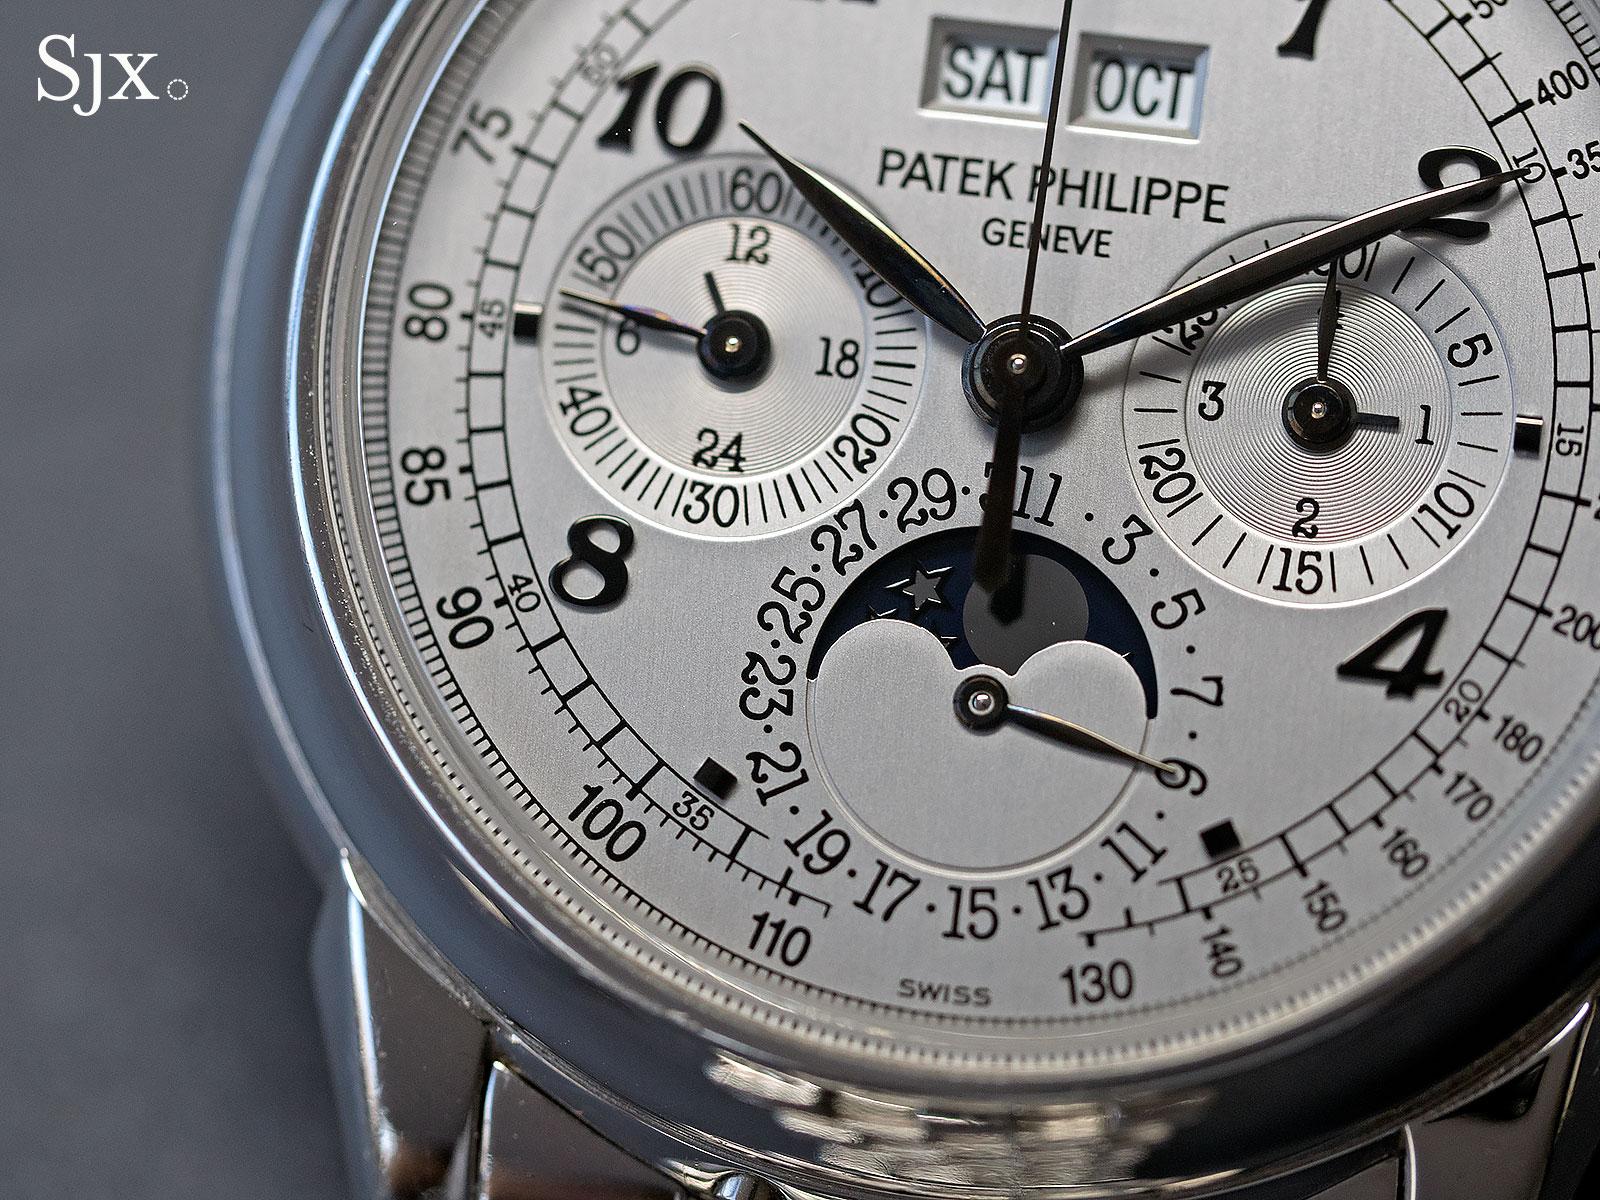 Patek Philippe 5970G Eric Clapton Breguet numbers 2